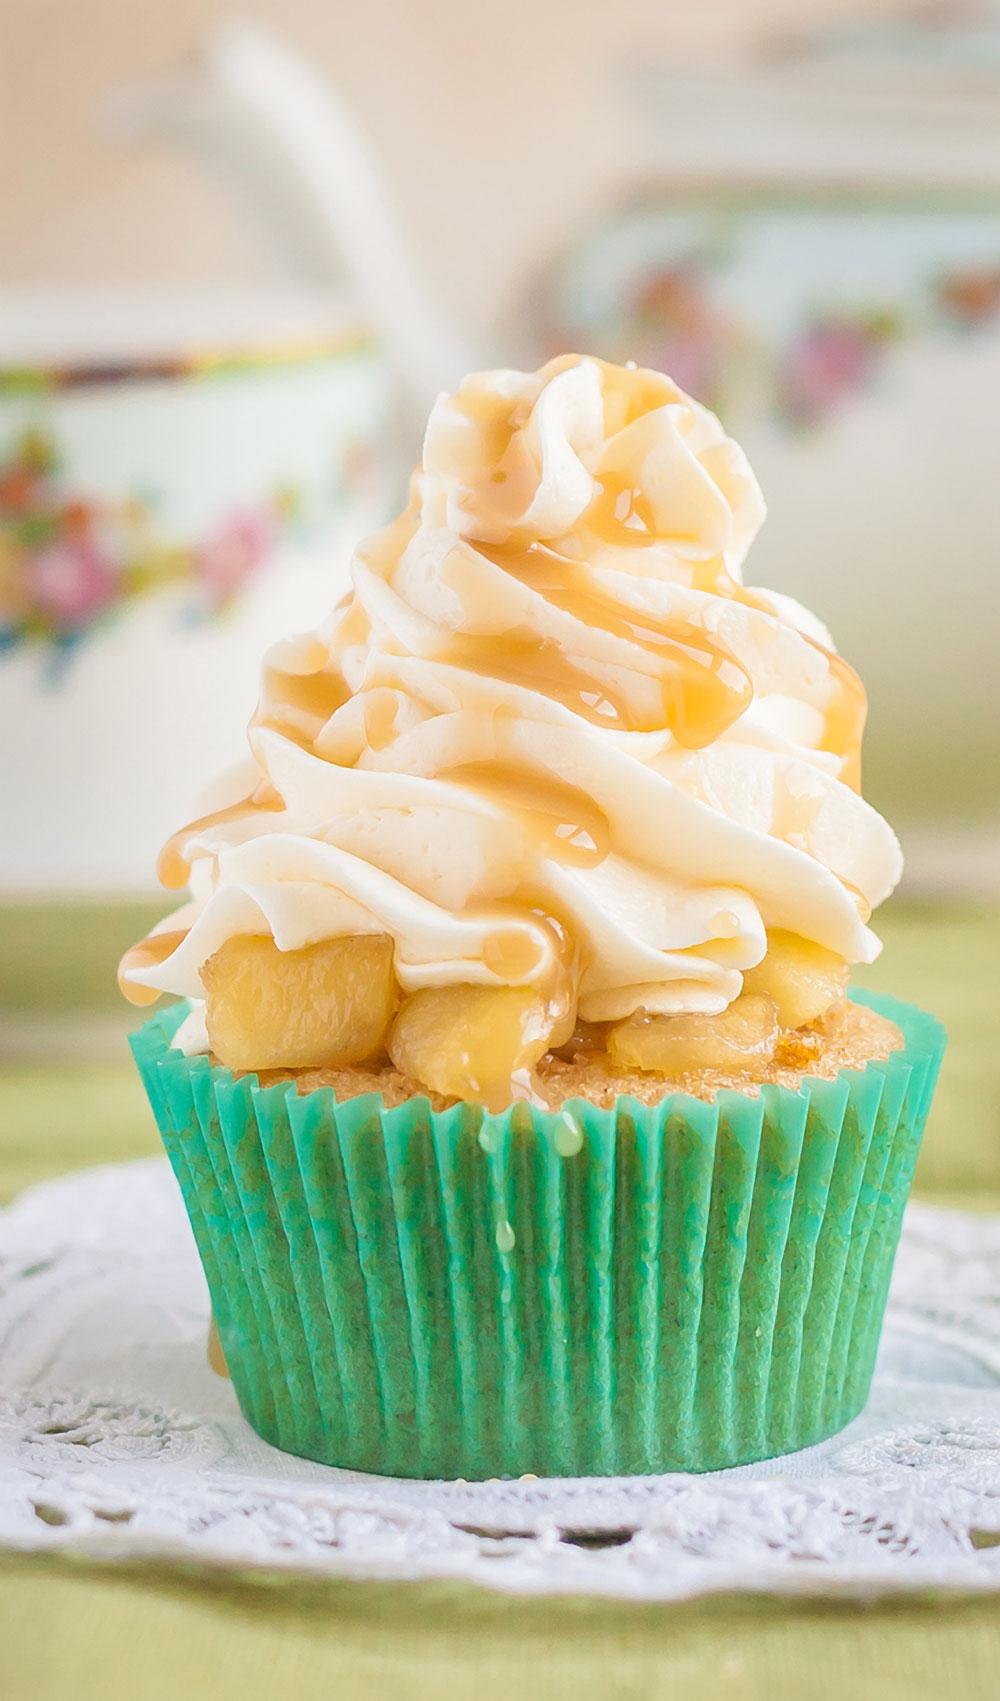 Gluten Free Apple Pie Cupcakes